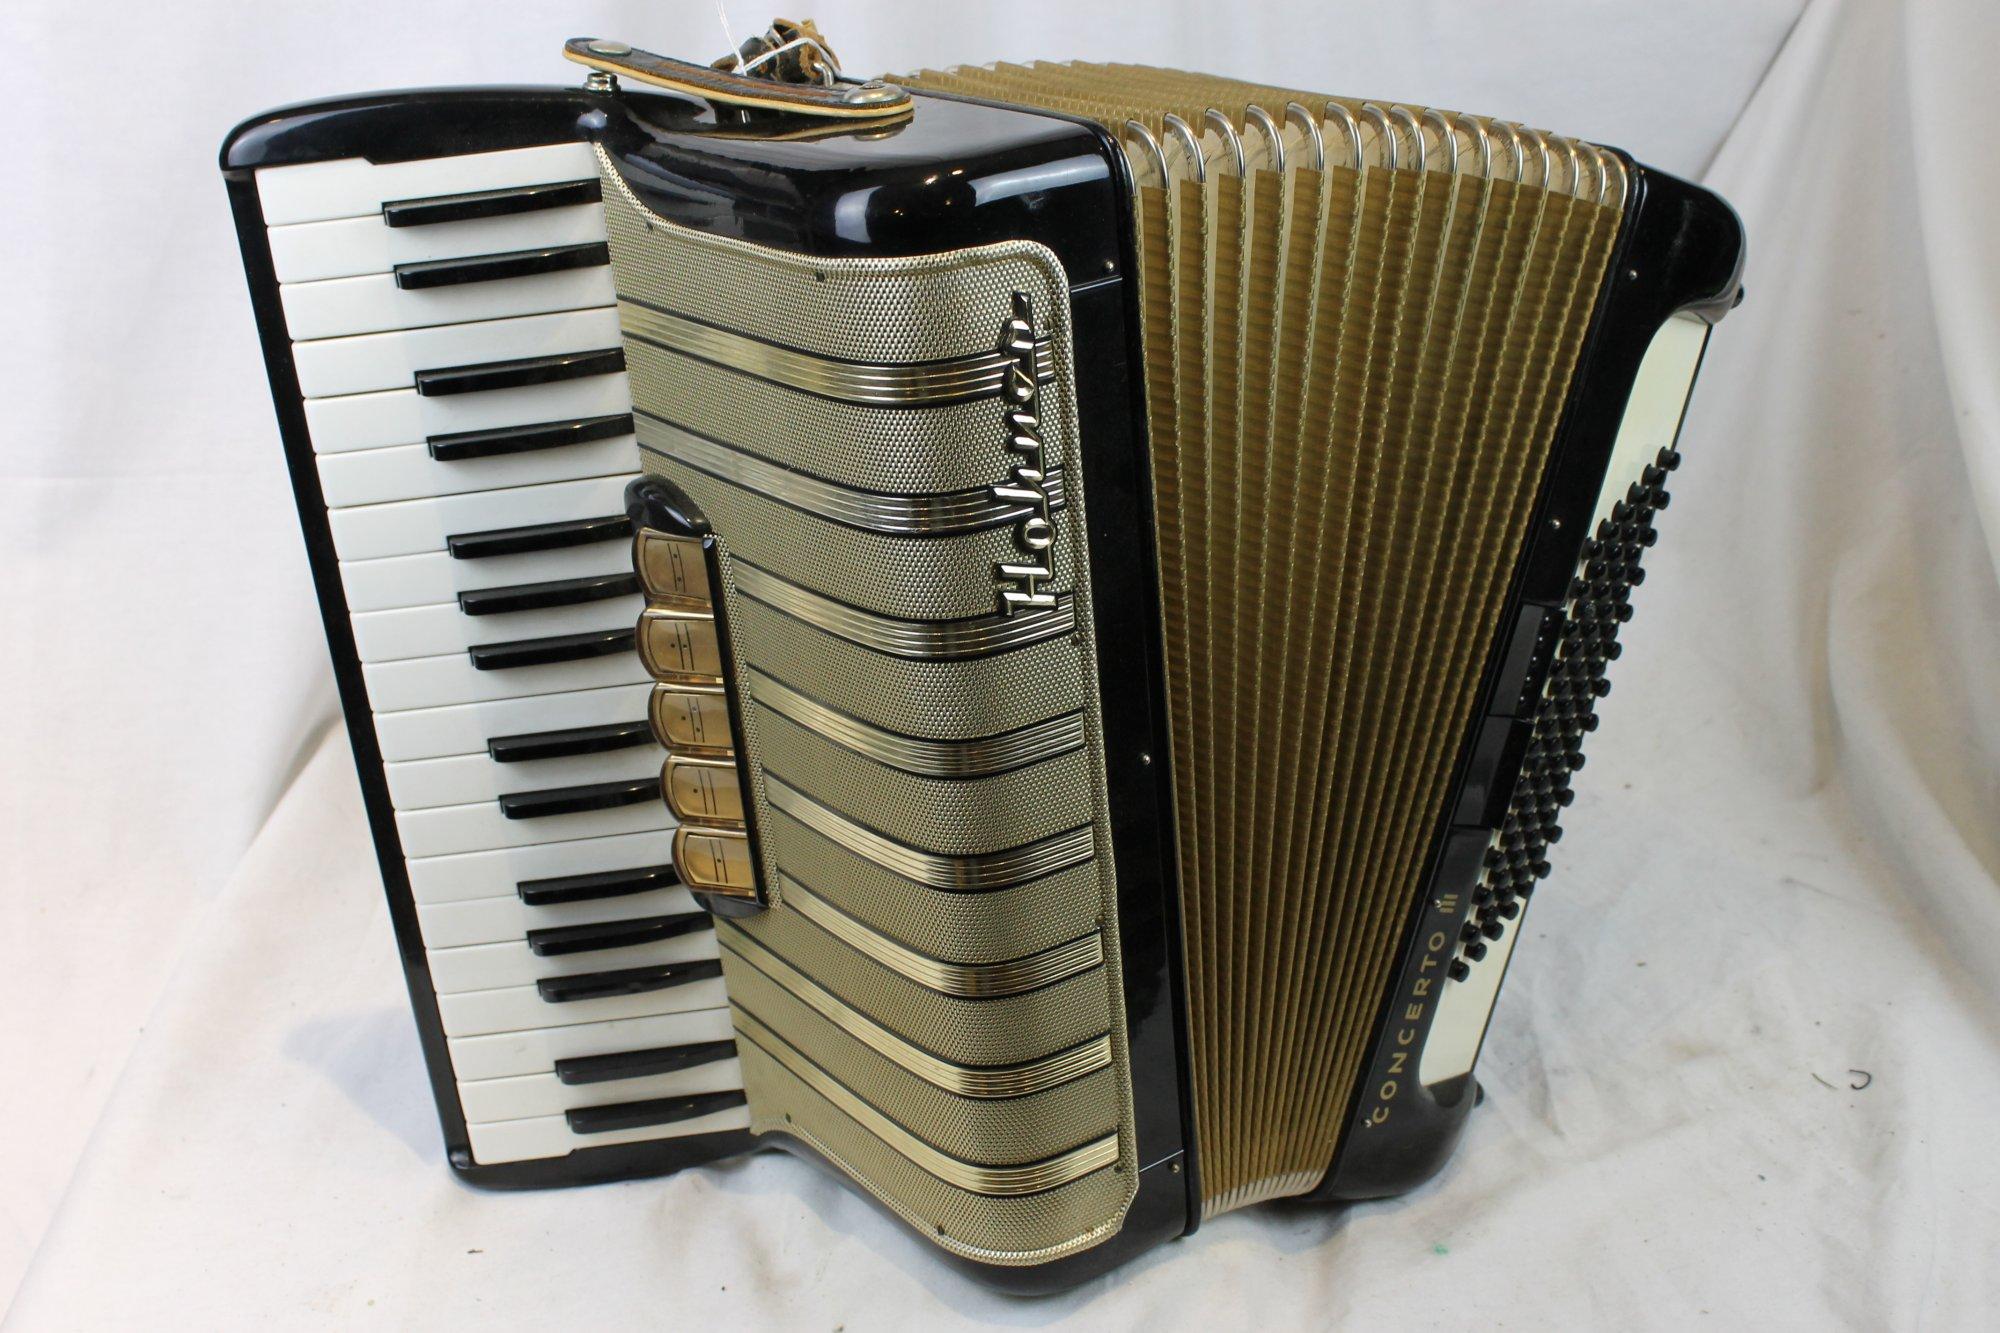 3284 - Black Hohner Concerto III Piano Accordion LMM 34 72